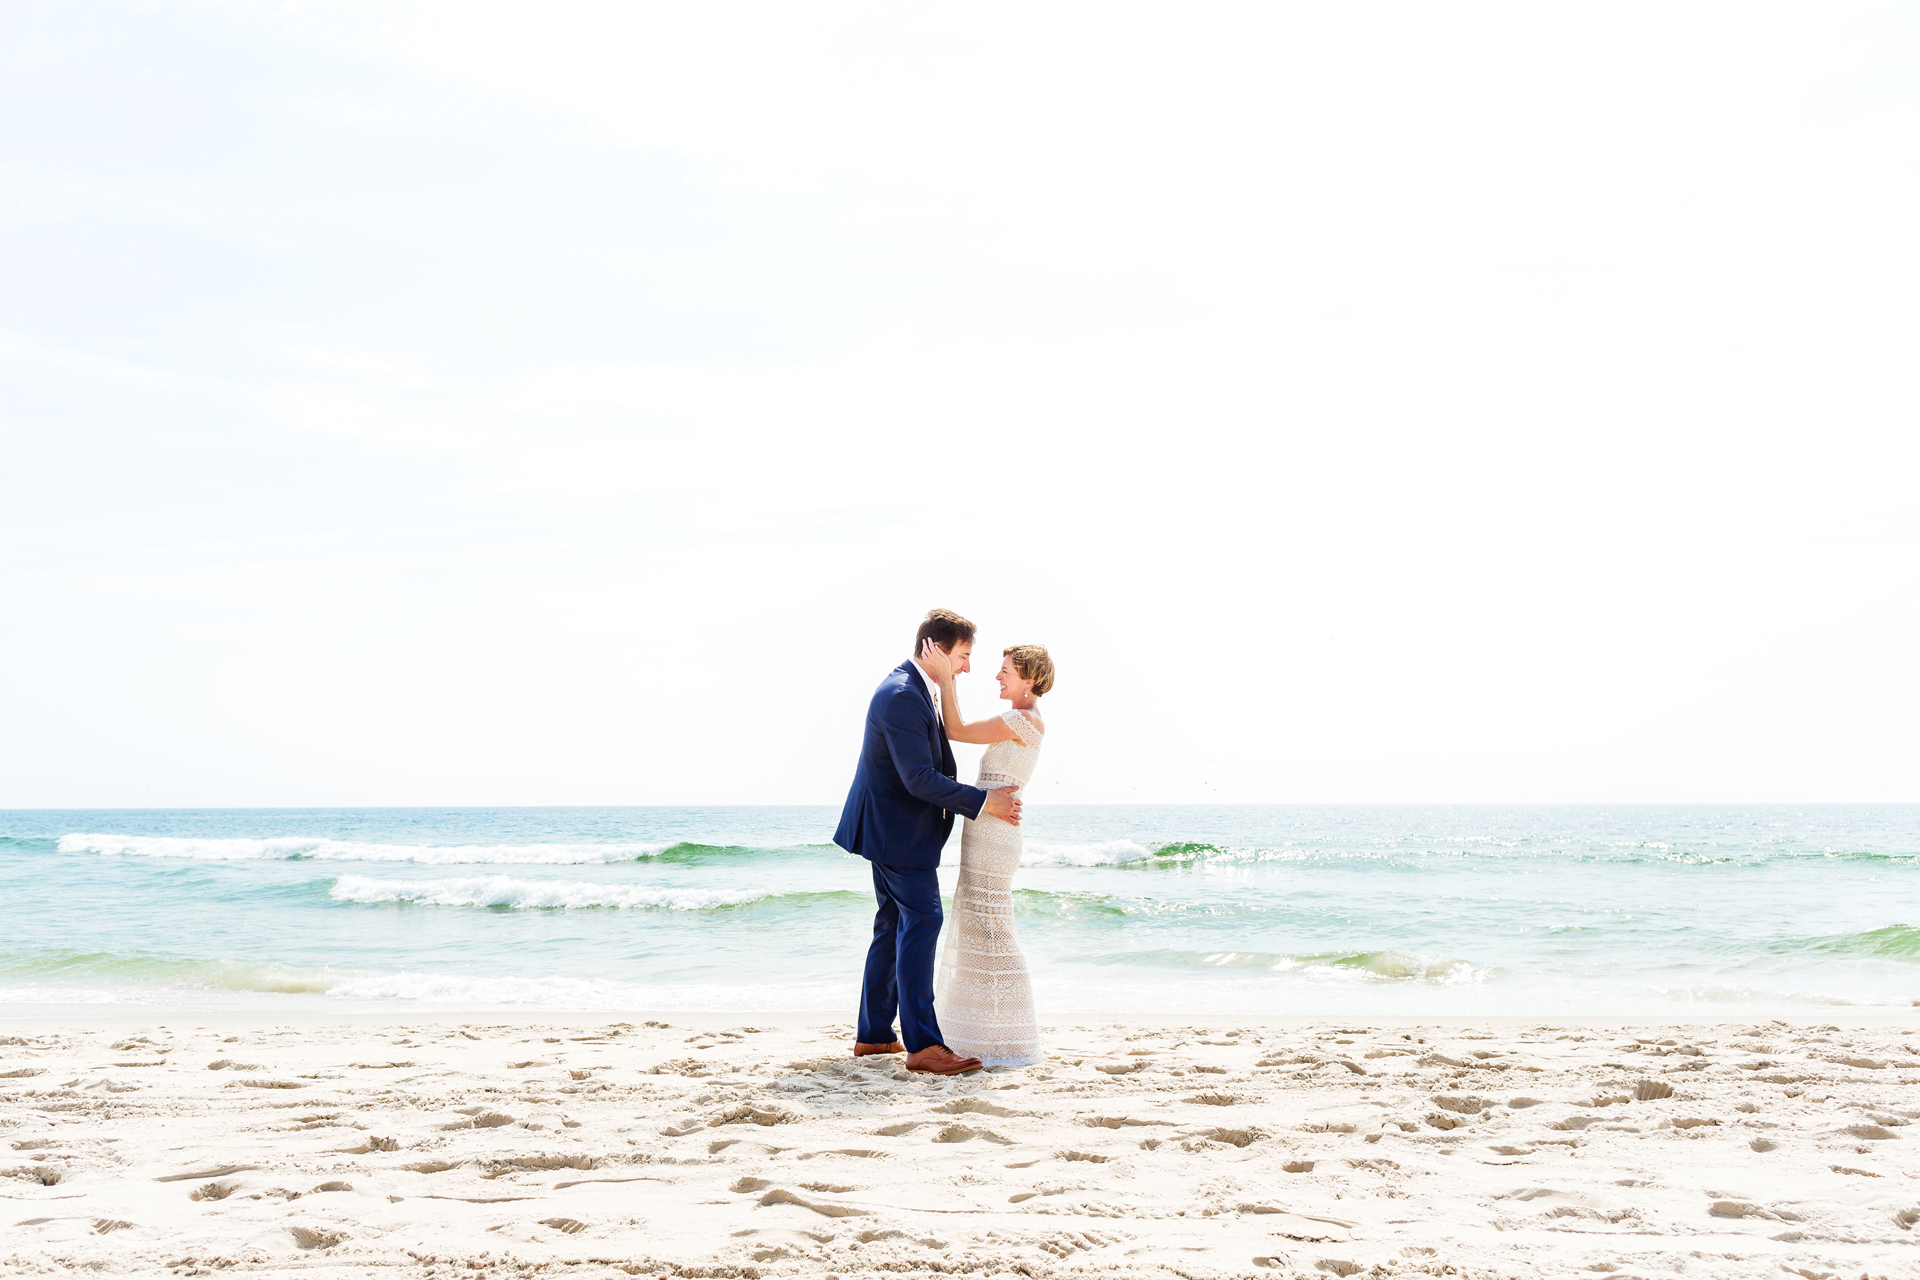 New Jersey Beach Elopement Portrait Photography | A mid-day summer wedding couple portrait